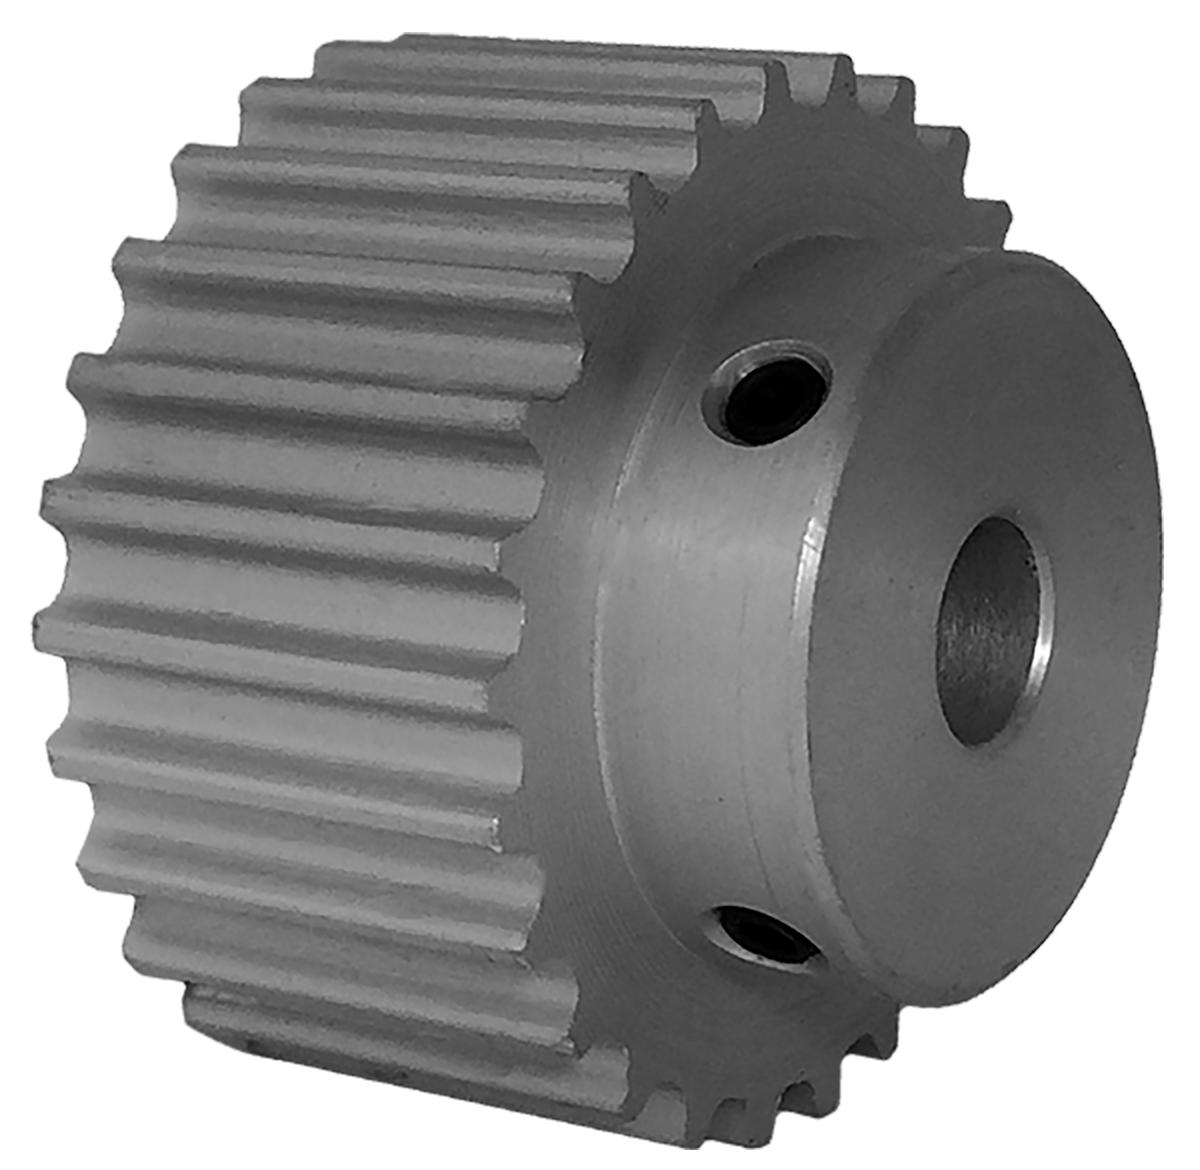 26-5M15M6A8 - Aluminum Powerhouse®HTD® Pulleys